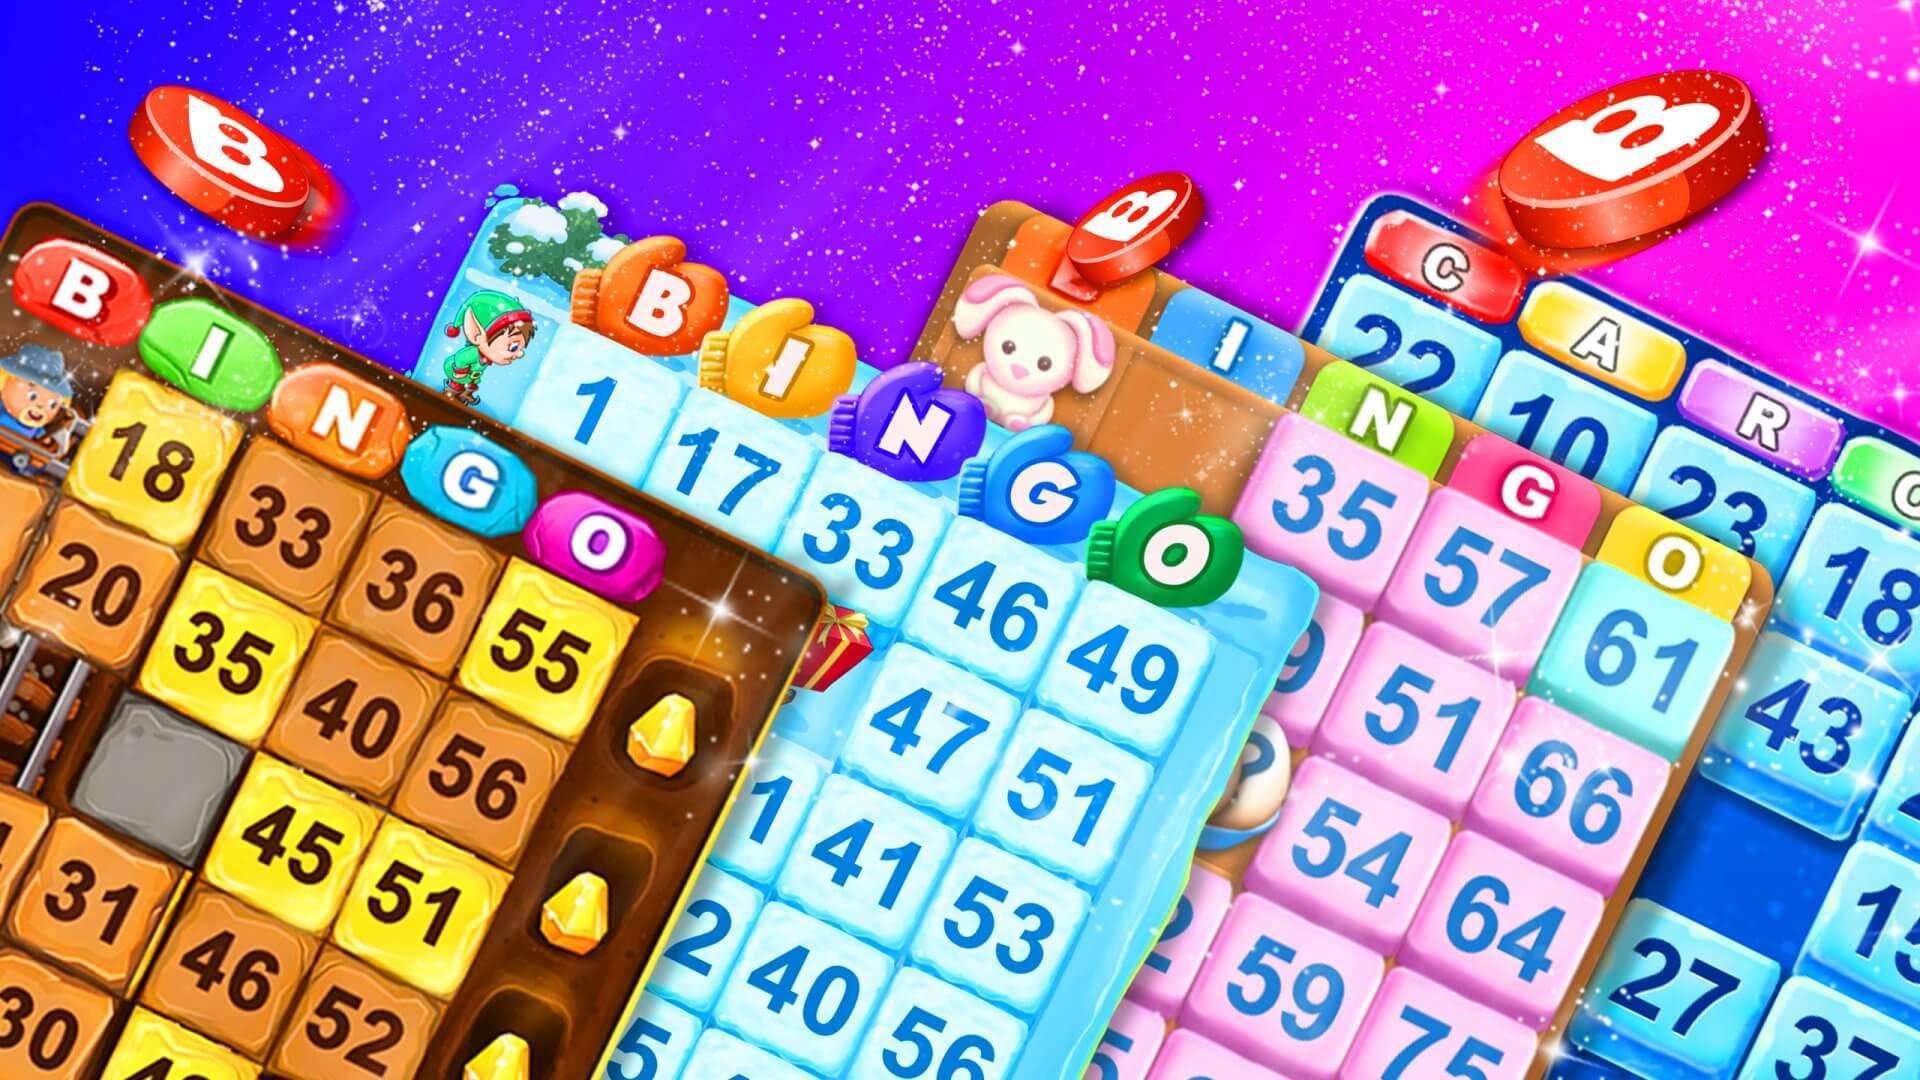 Bingo! yellowHEAD's Creative Analysis Technology Helps GSN Increase Revenues